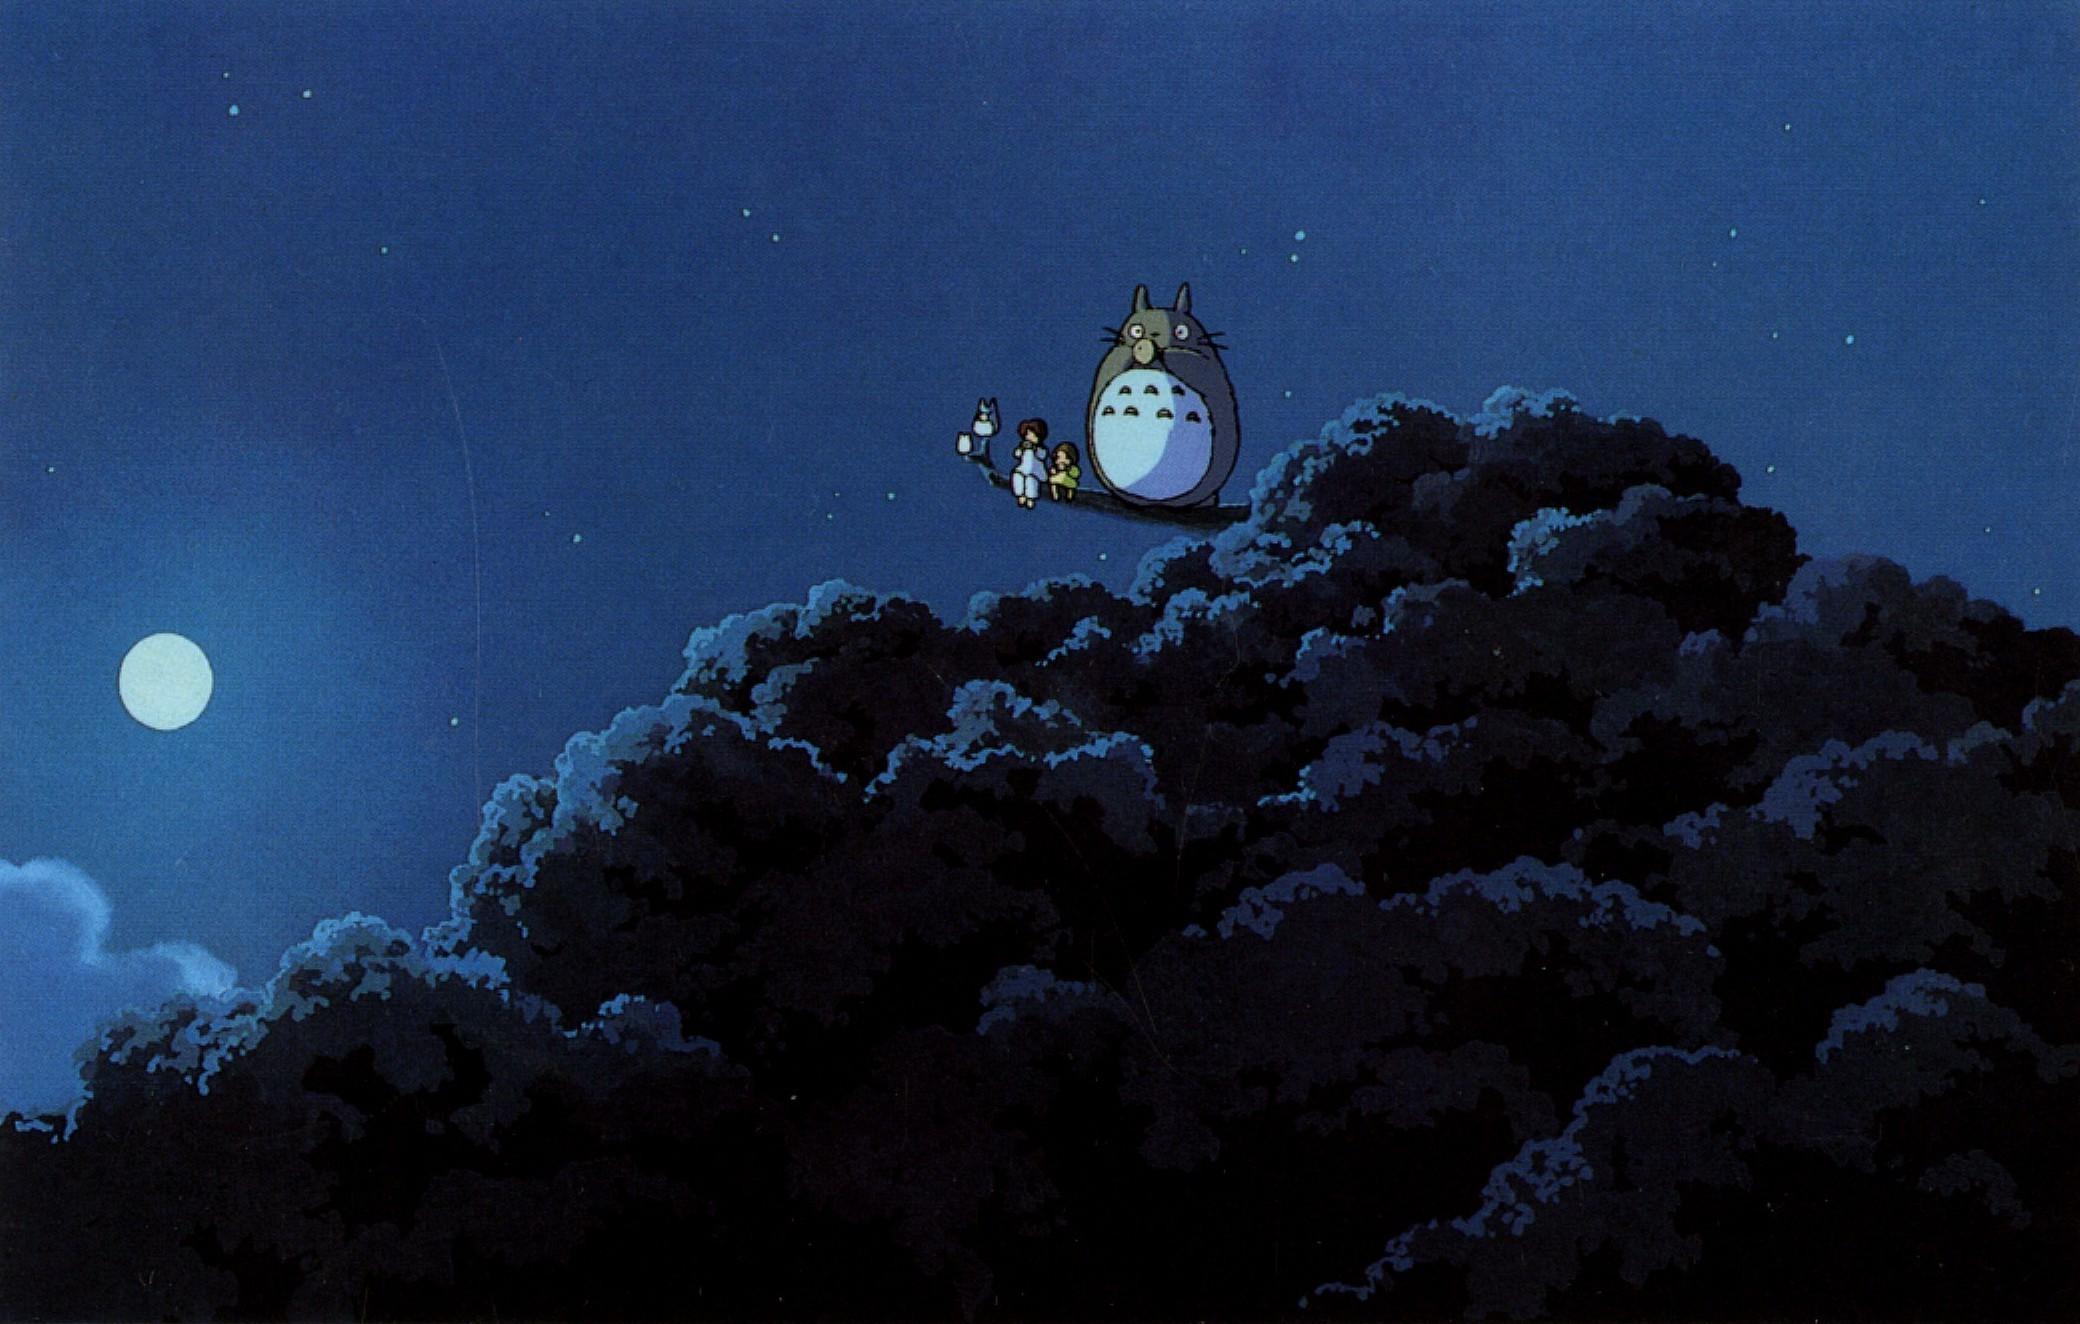 2080x1324 Px Anime Hayao Miyazaki My Neighbor Totoro